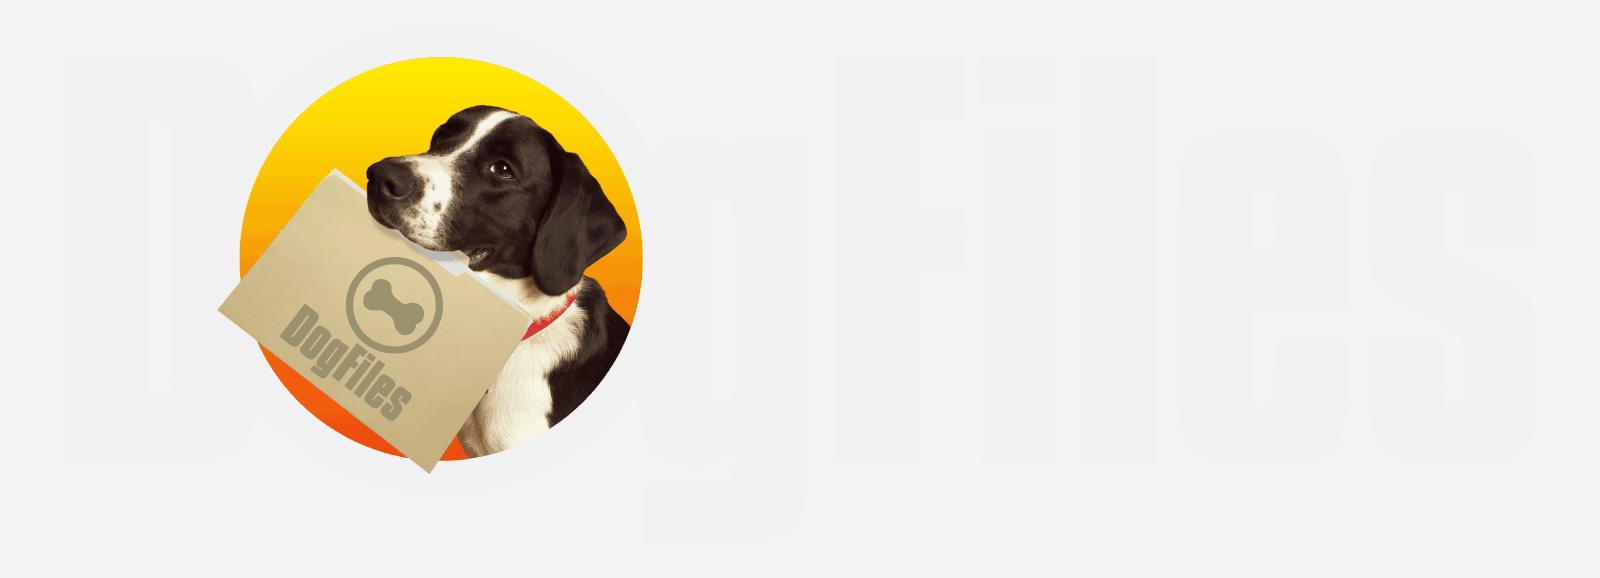 Dog Files